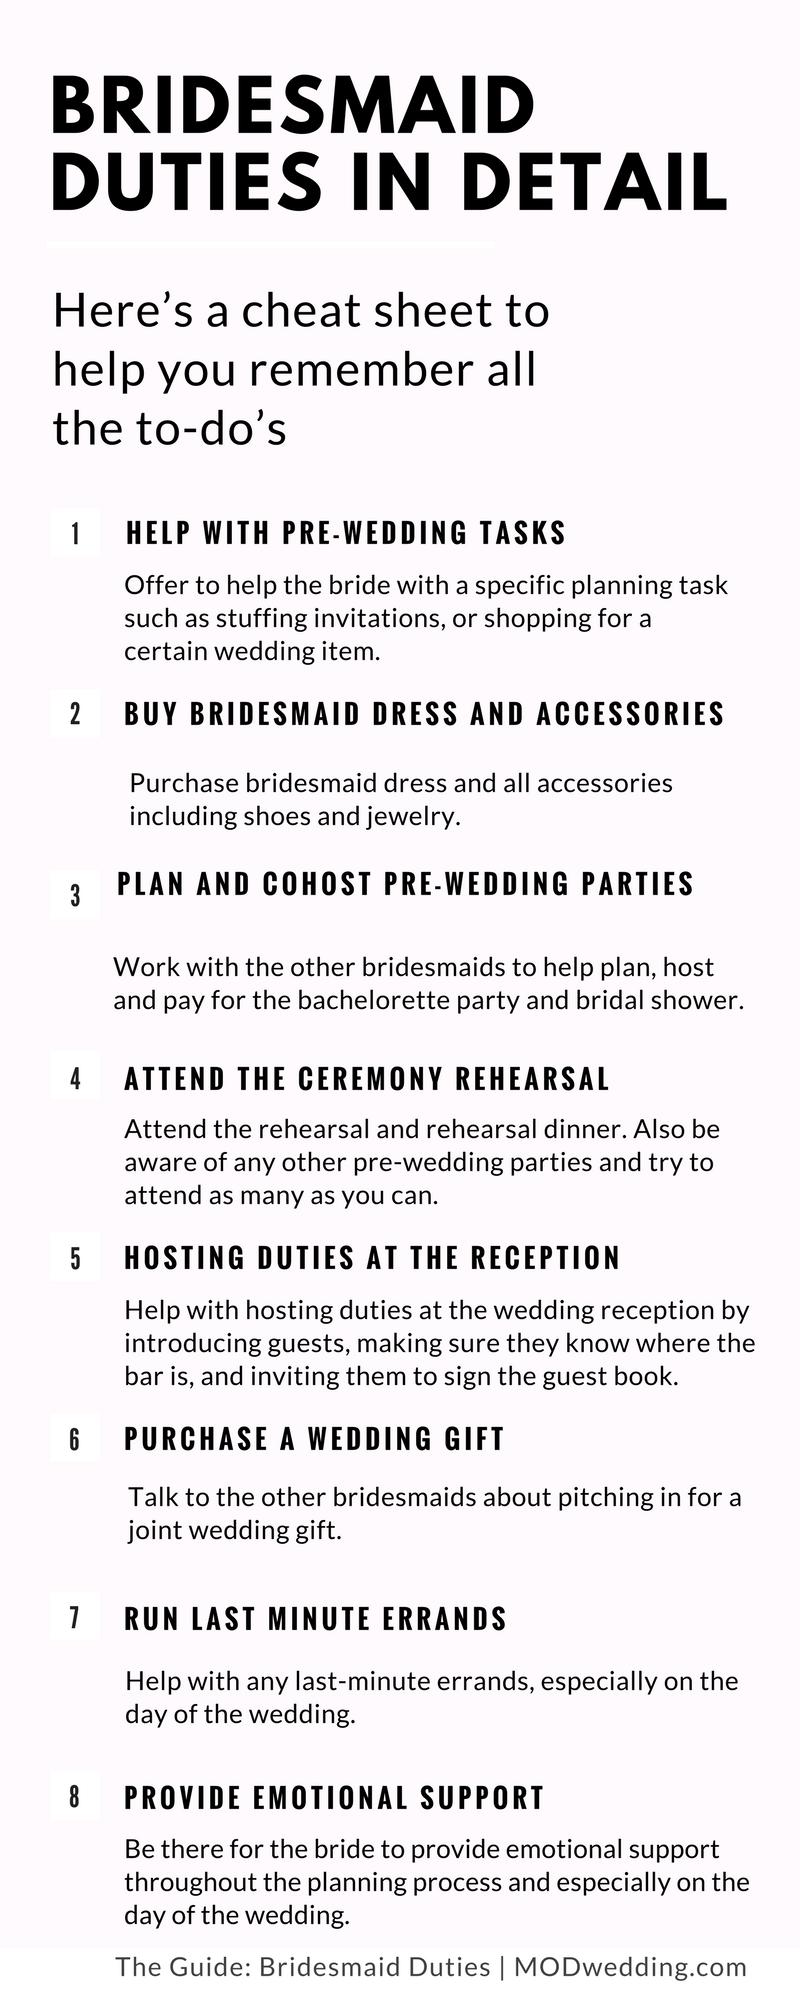 Wedding planning bridesmaid duties in detail bridesmaid duties wedding planning bridesmaid duties in detail sciox Gallery